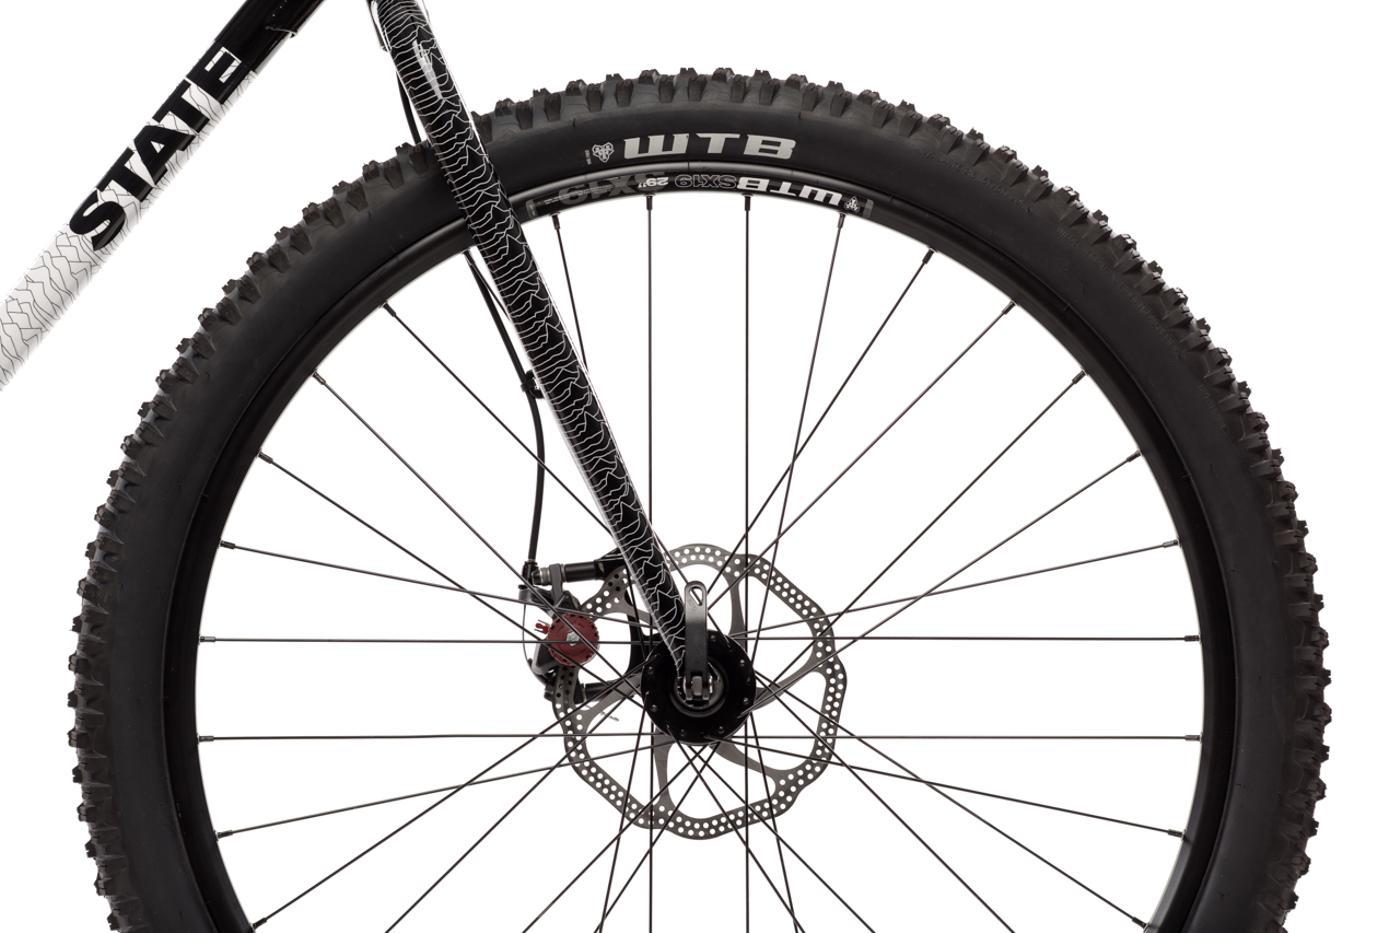 State_Bicycle_Co_29er_Single_Speed_MTB_STD_31